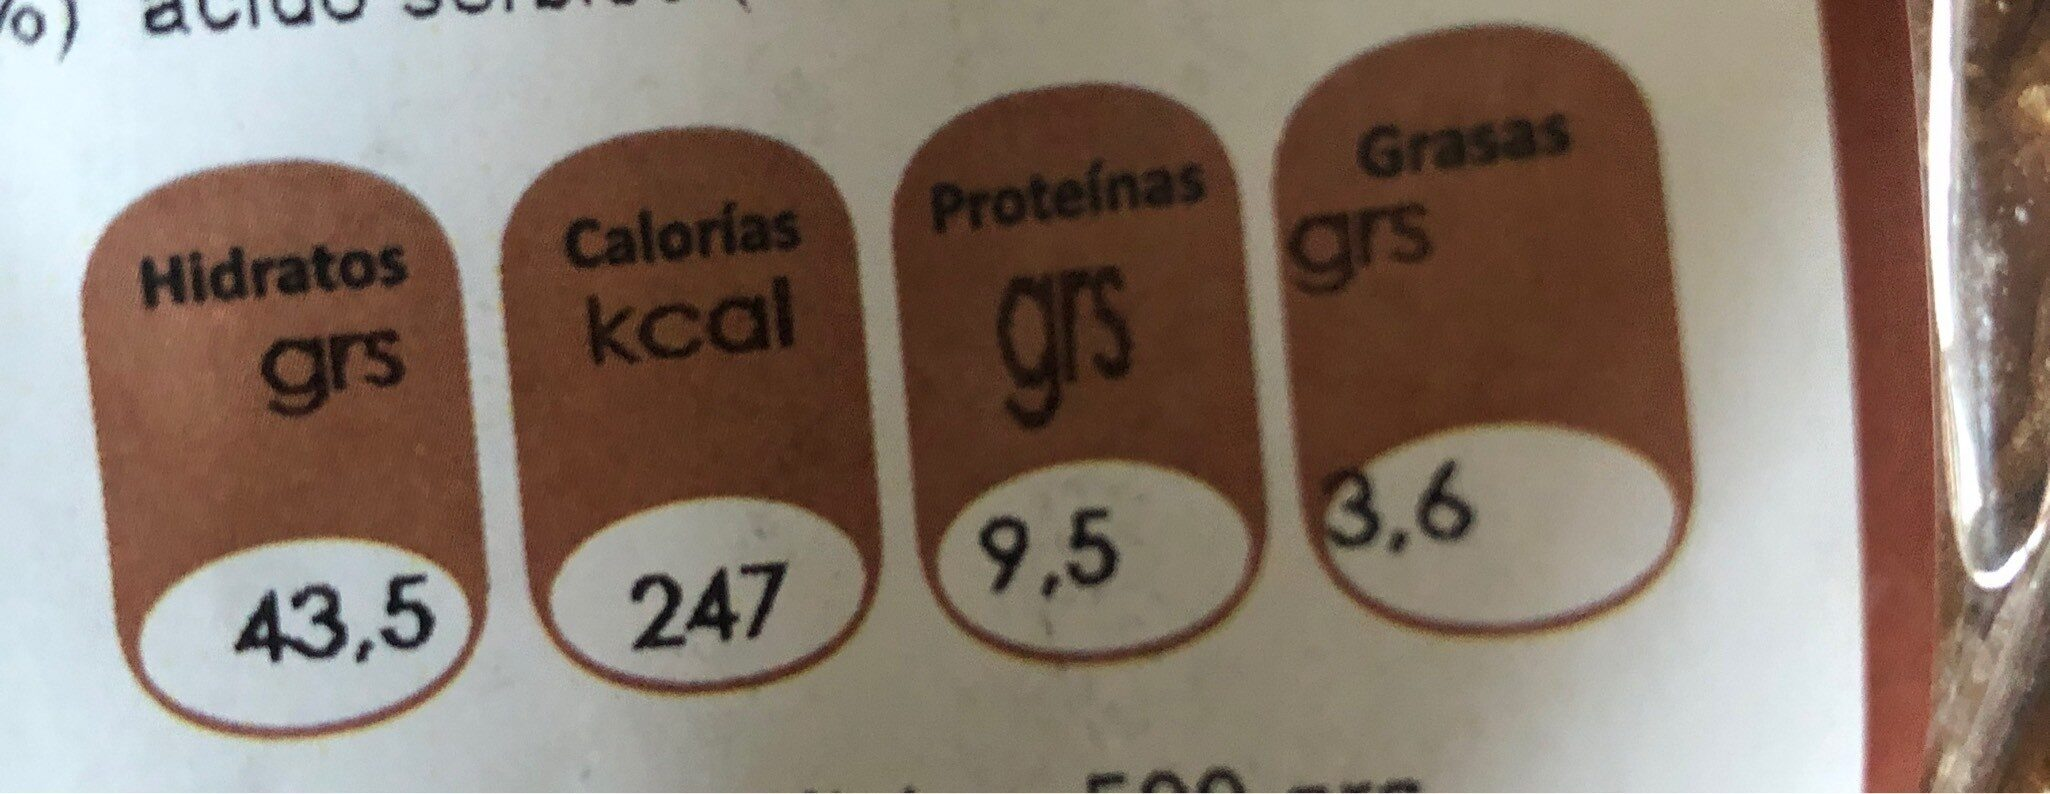 Vegan brot pan de chía y quinoa - Voedingswaarden - fr